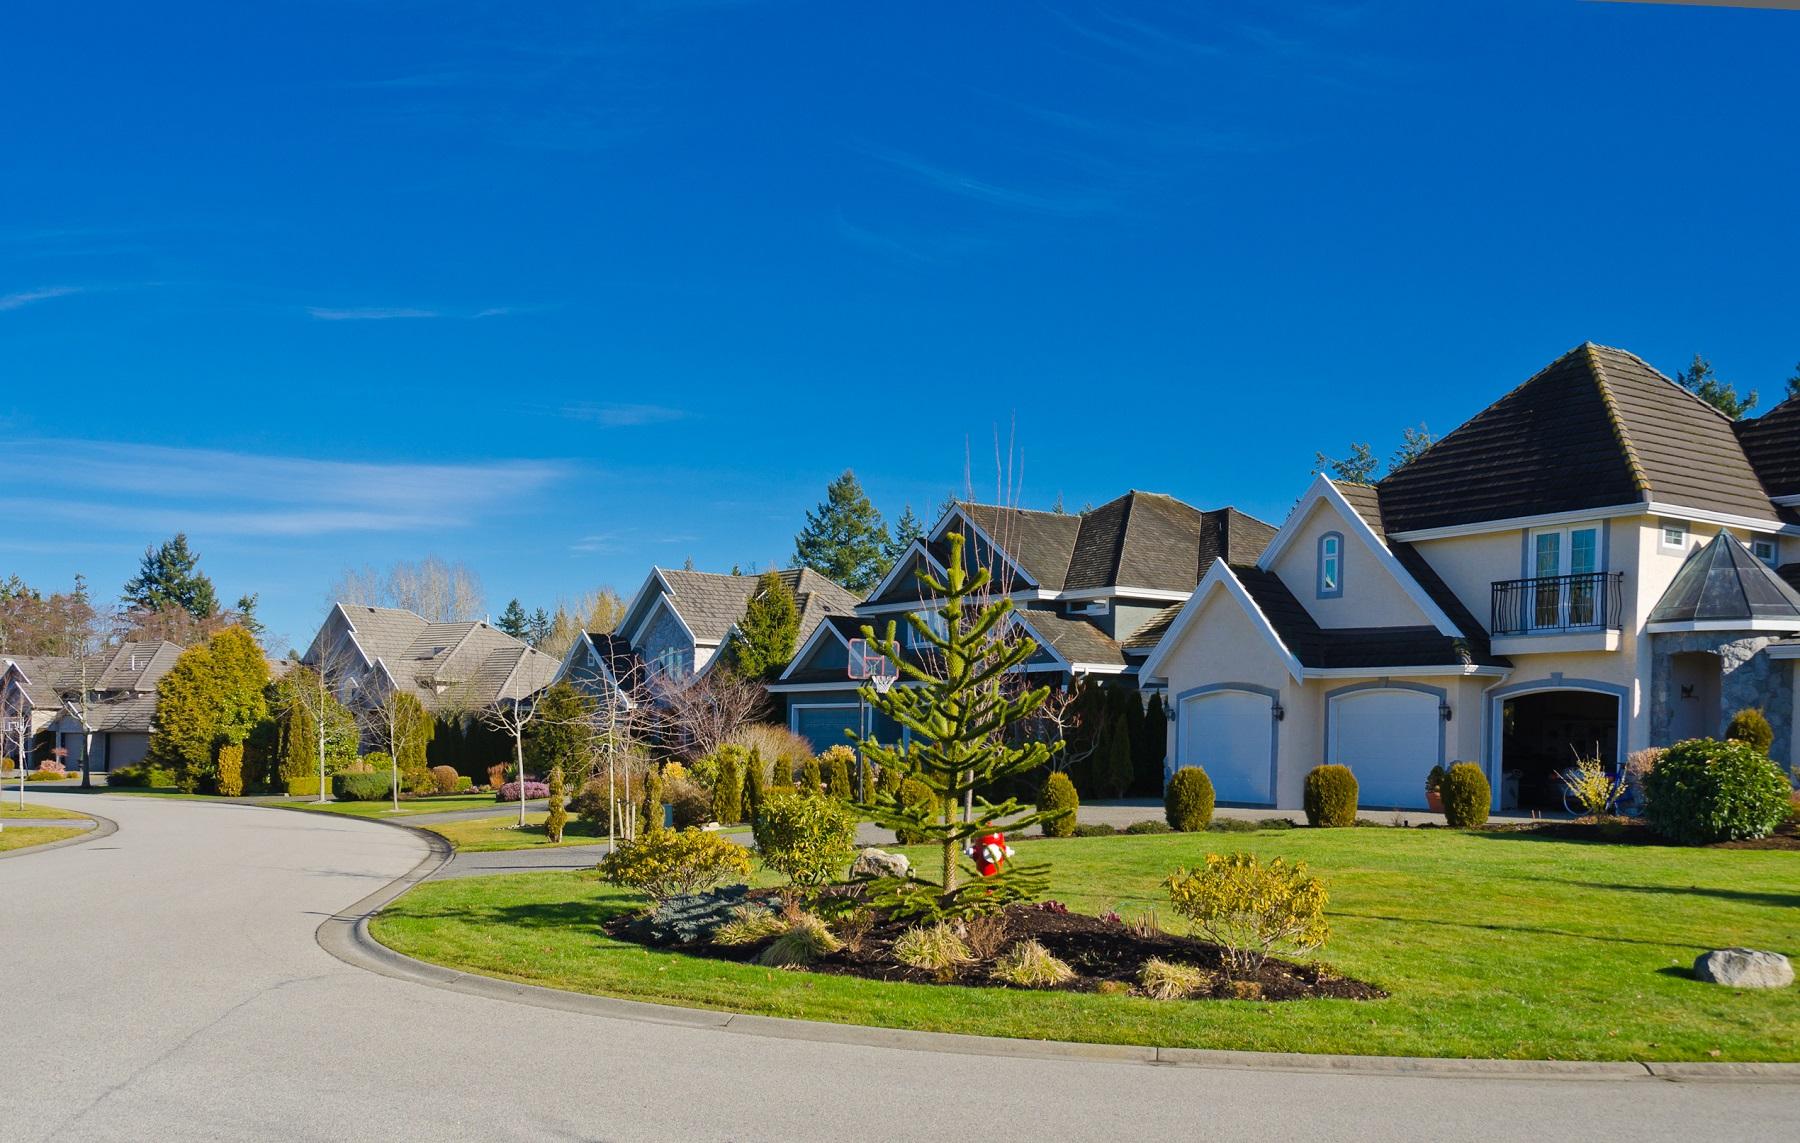 neighbodhood subdivision hoa.jpg